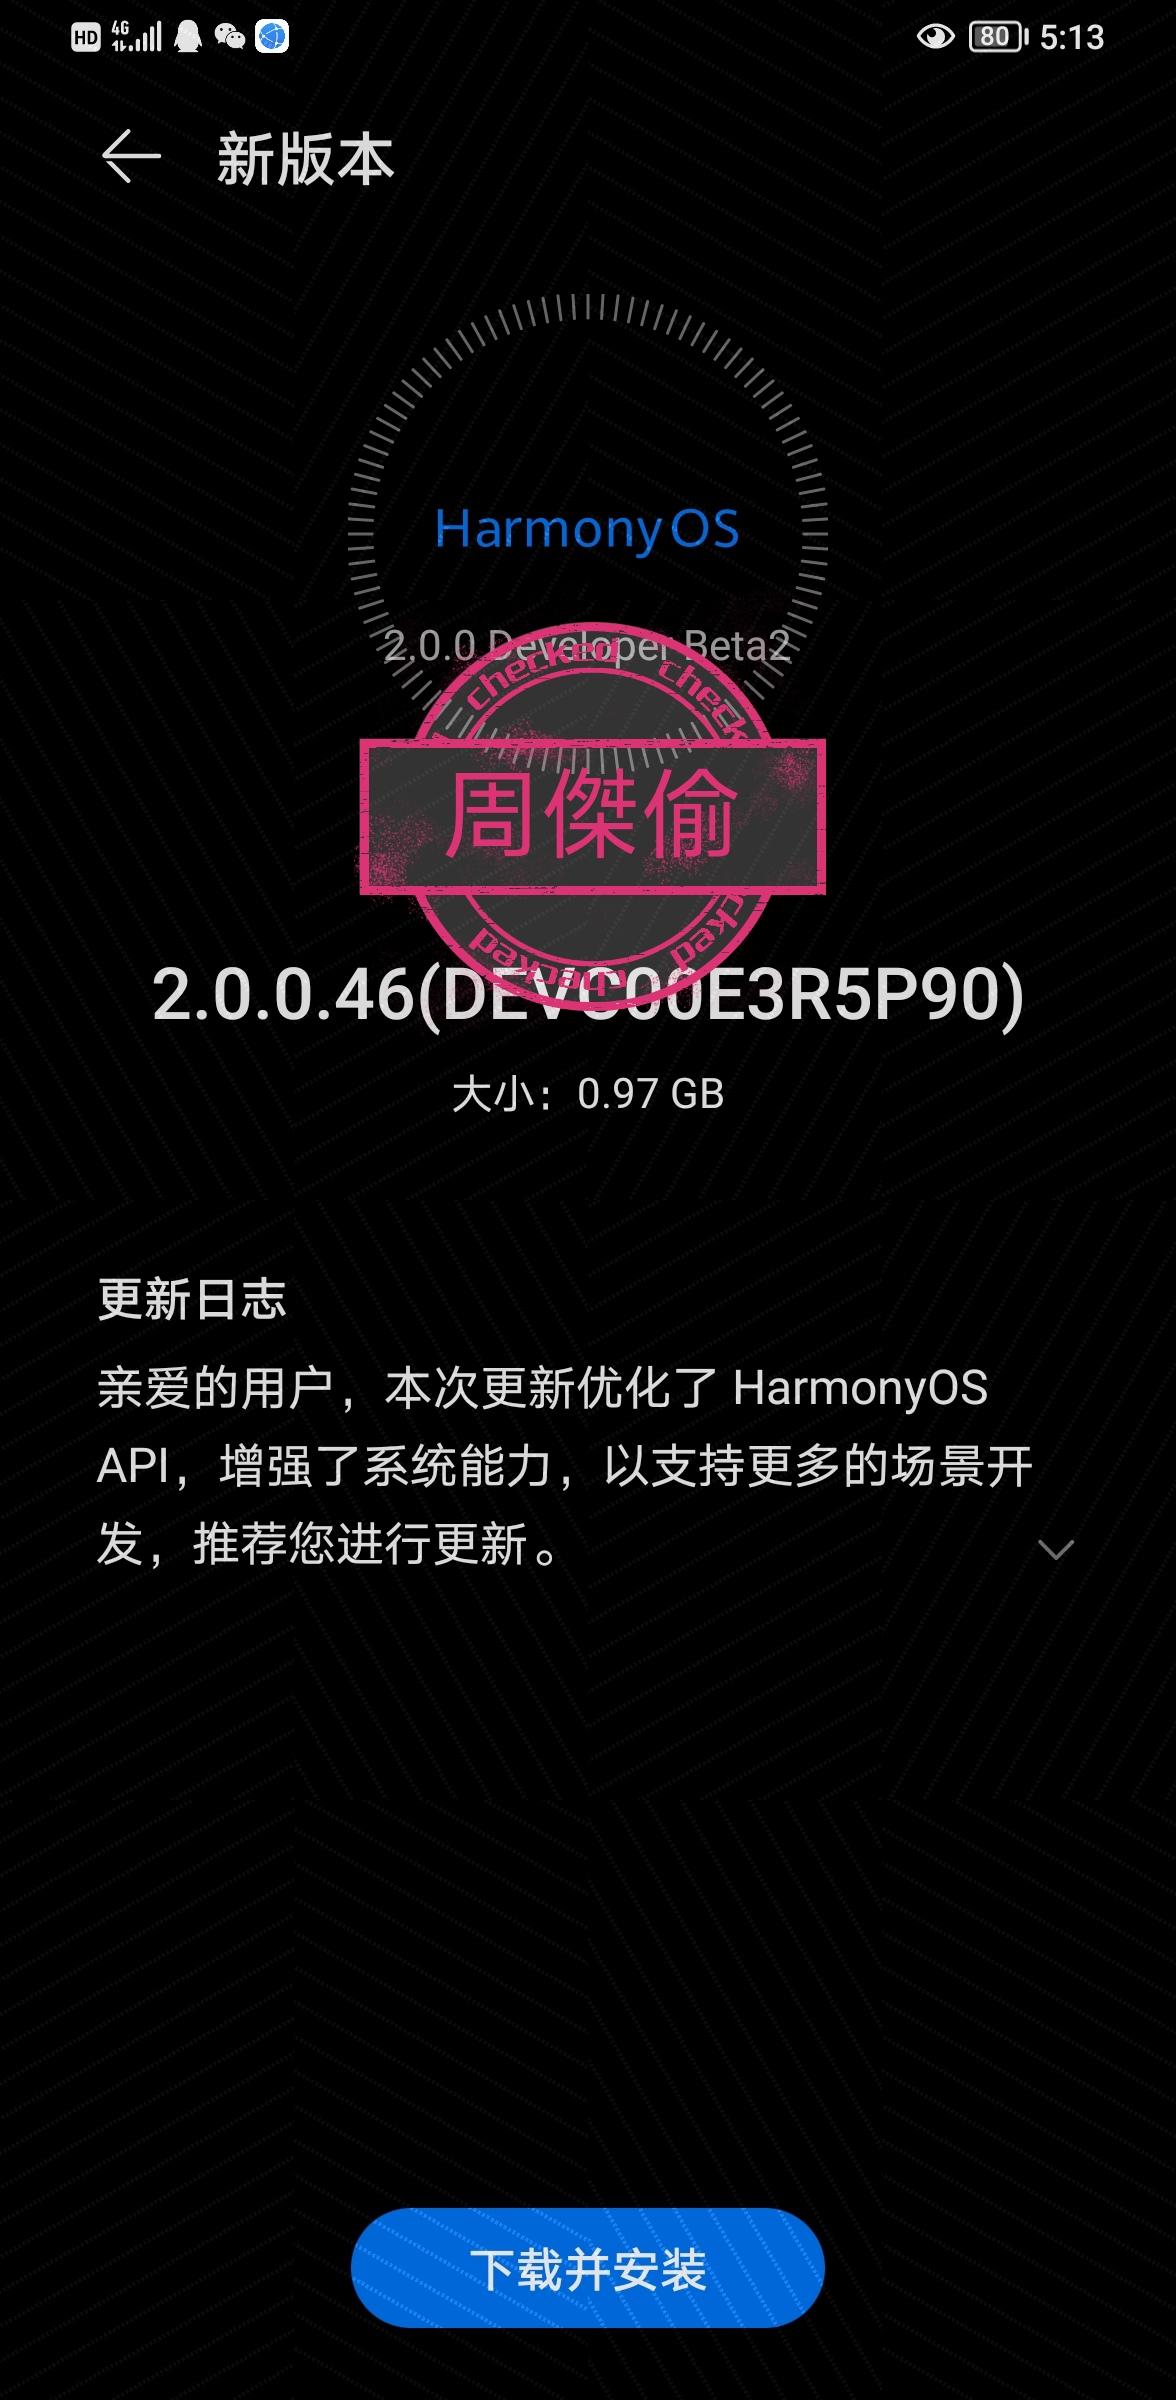 Screenshot_20210331_171330_com.huawei.android.hwouc_edit_54898319793702.jpg